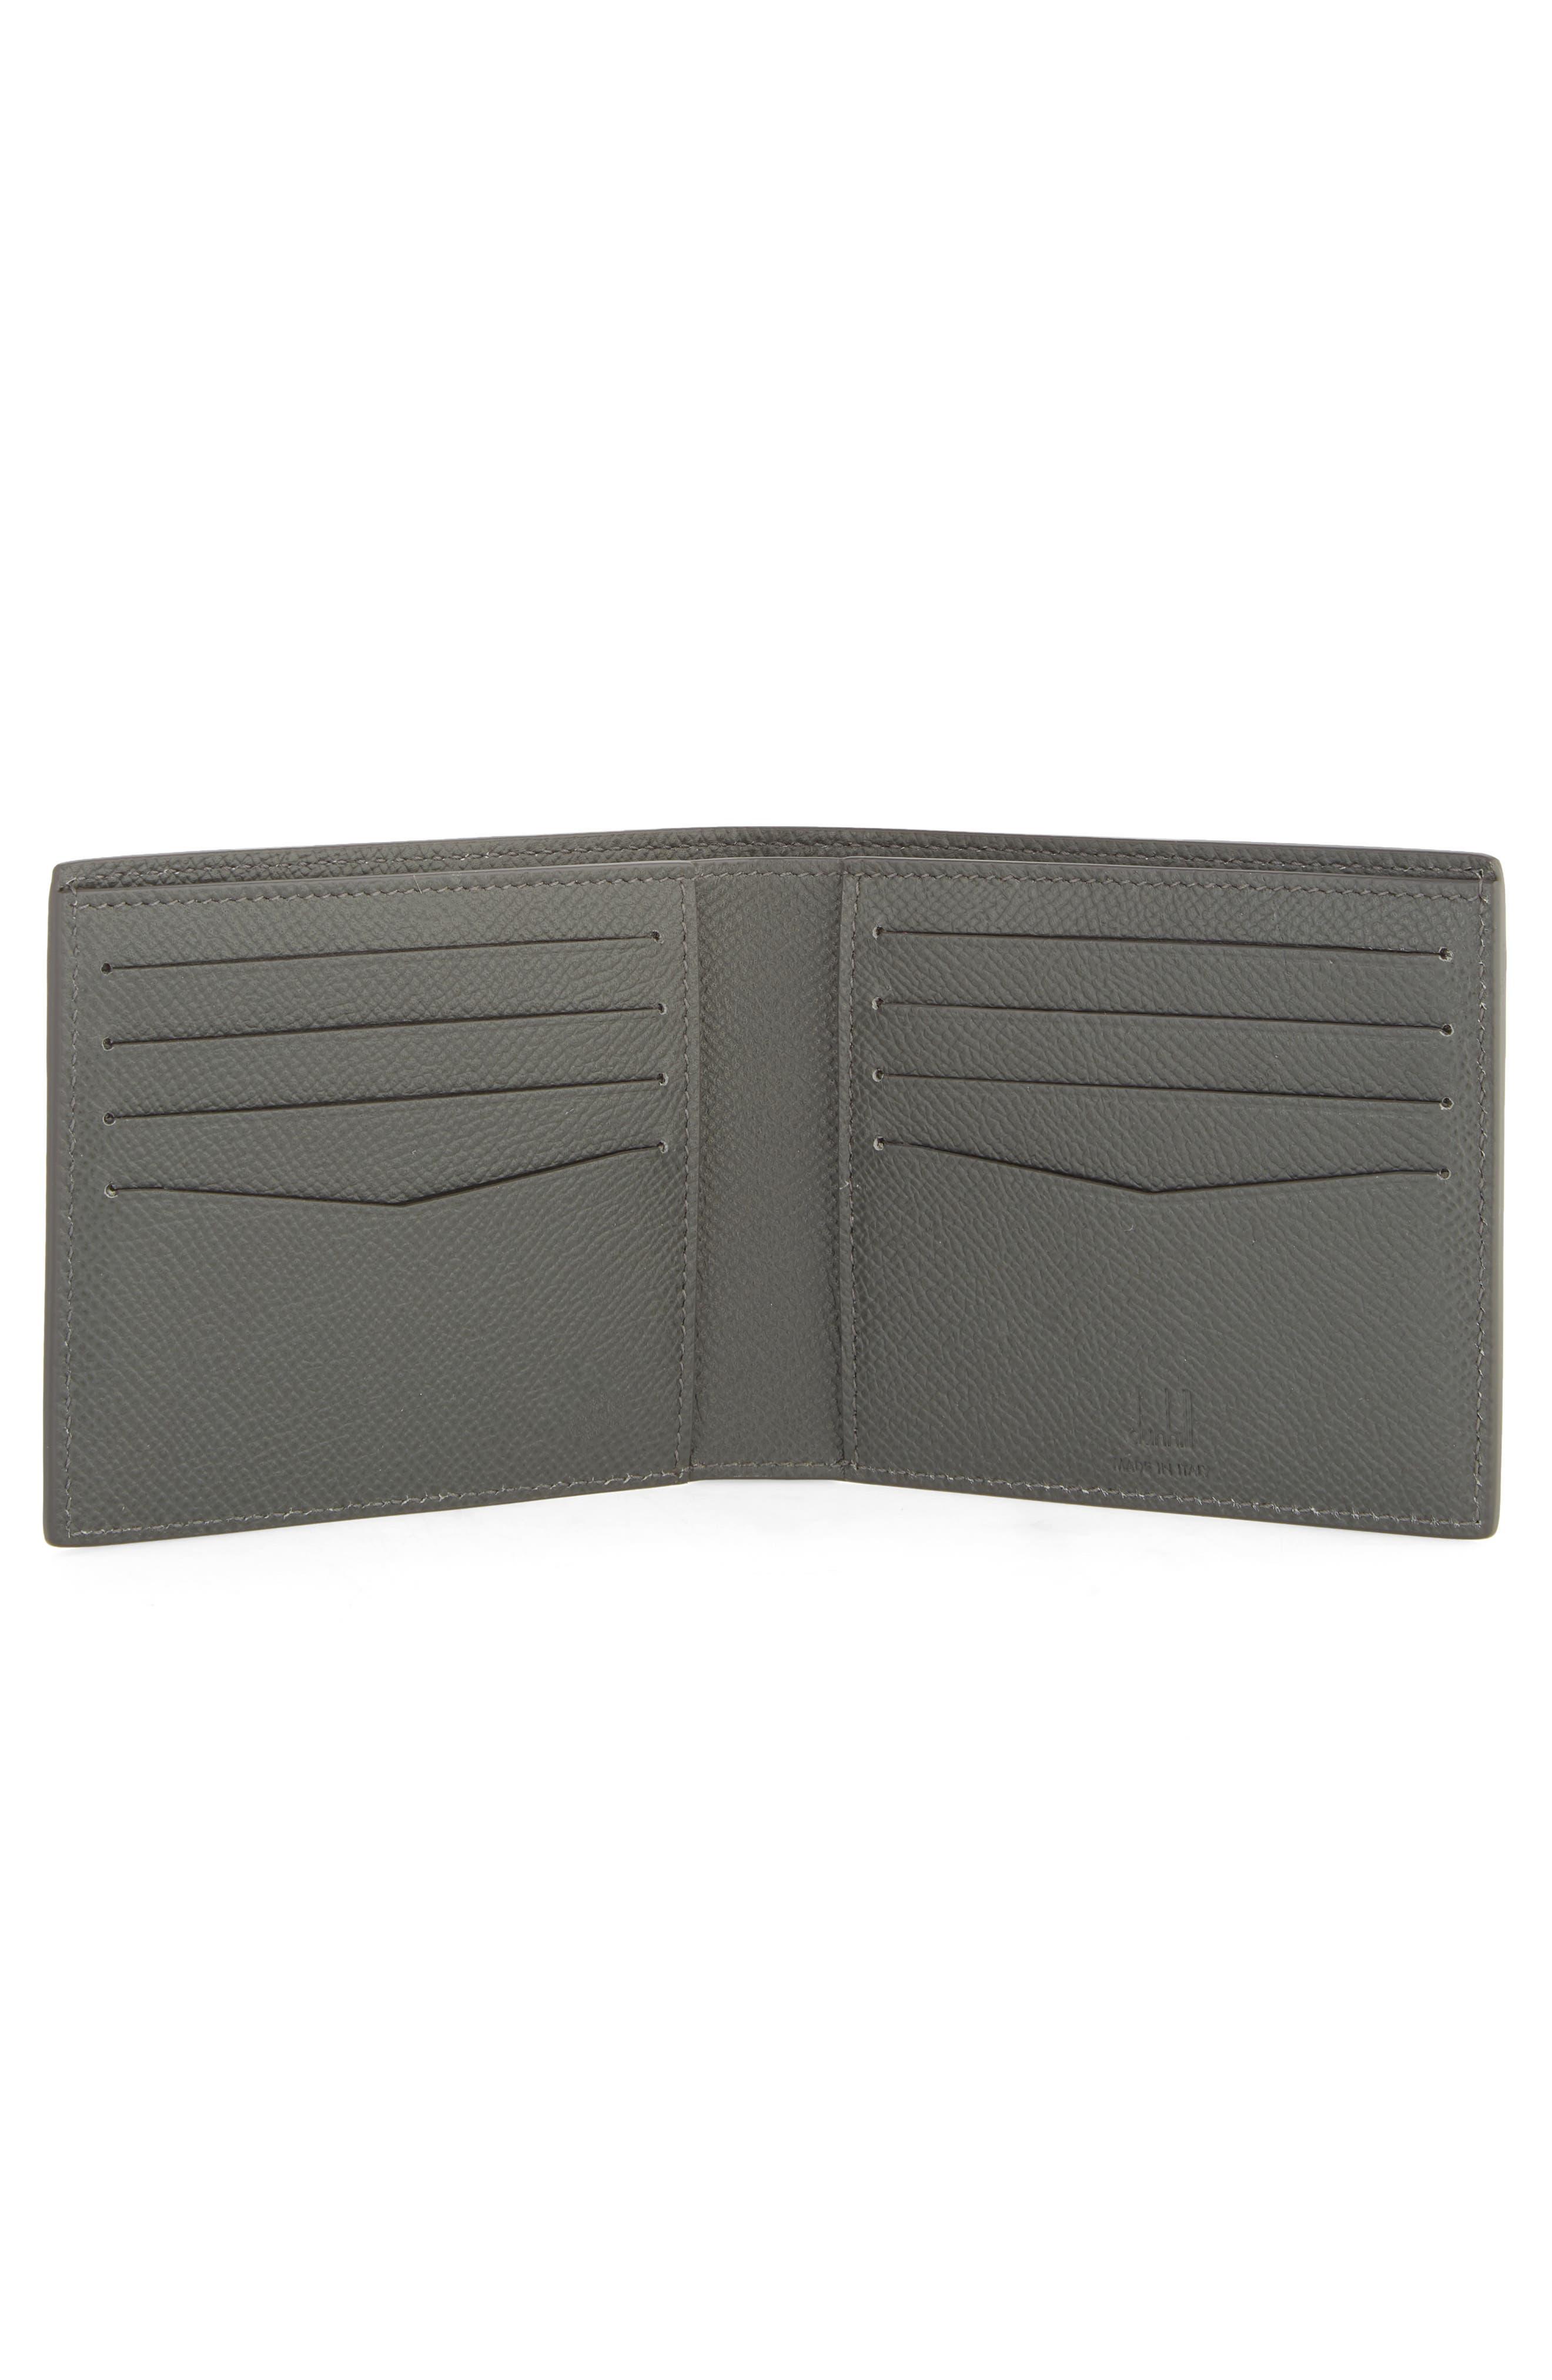 Cadogan Leather Wallet,                             Alternate thumbnail 2, color,                             GREY